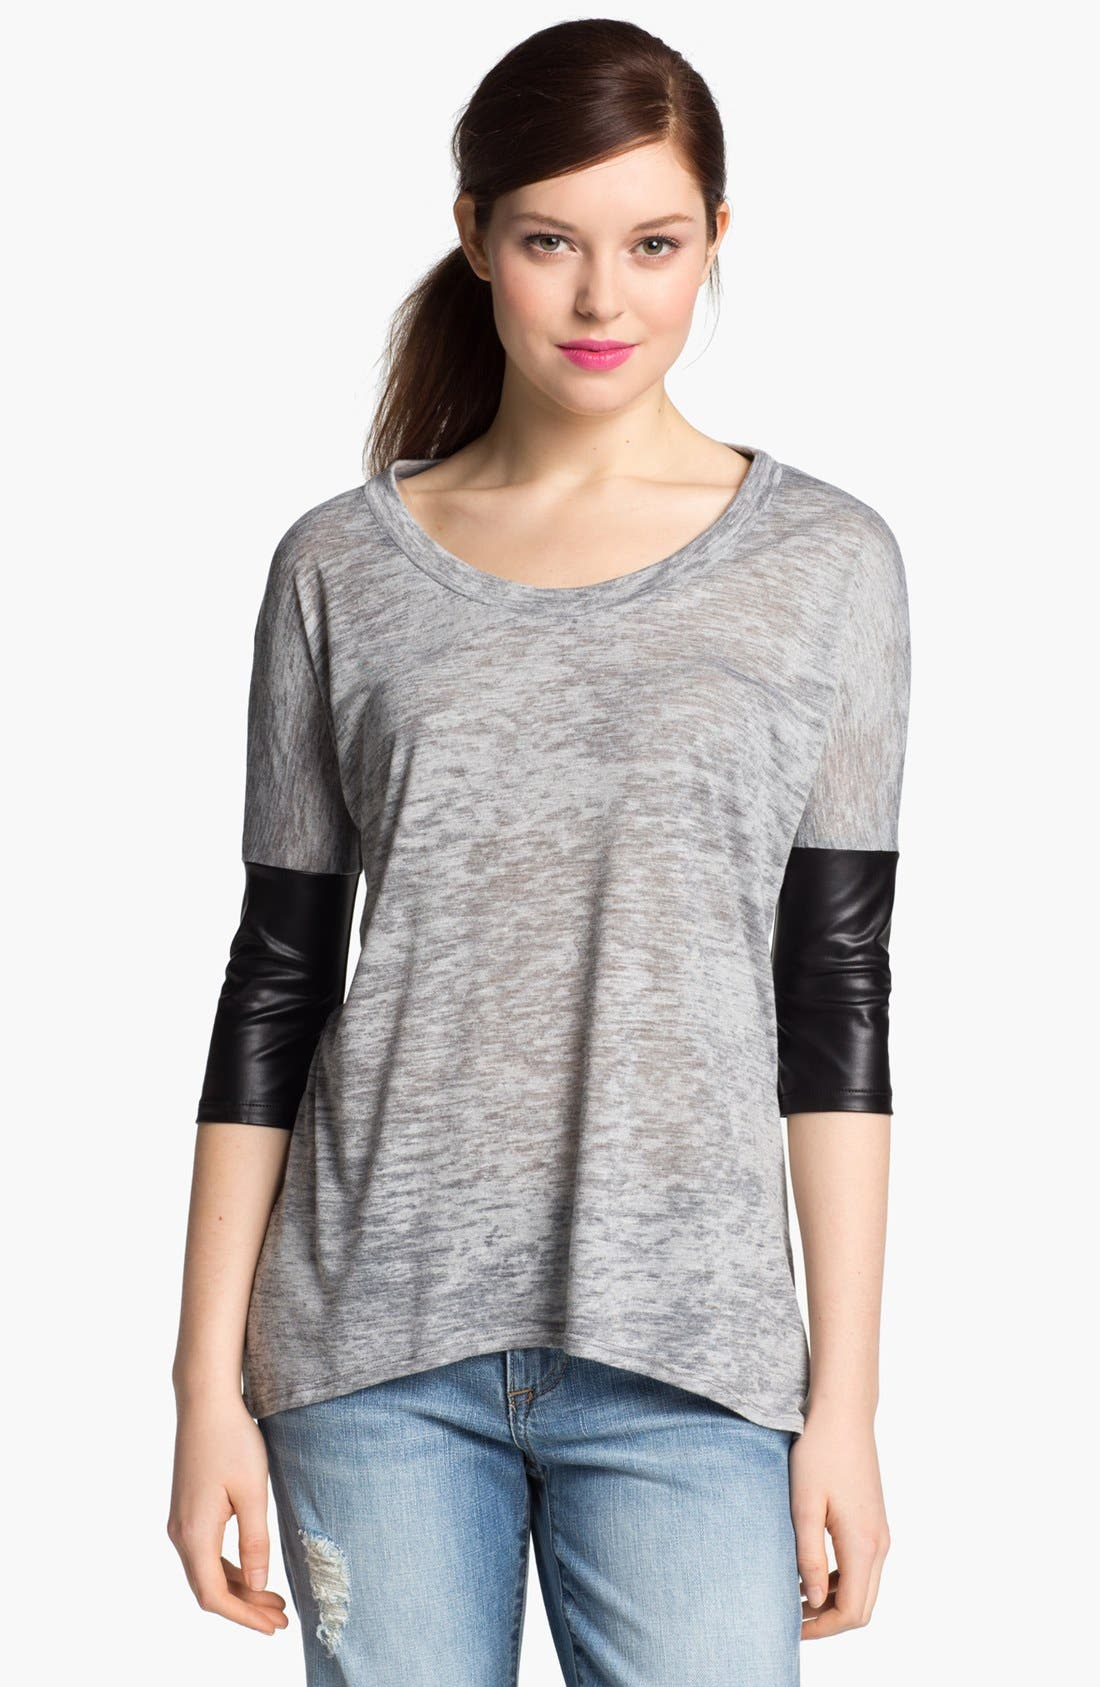 Main Image - I.Ner Faux Leather Sleeve Slub Tee